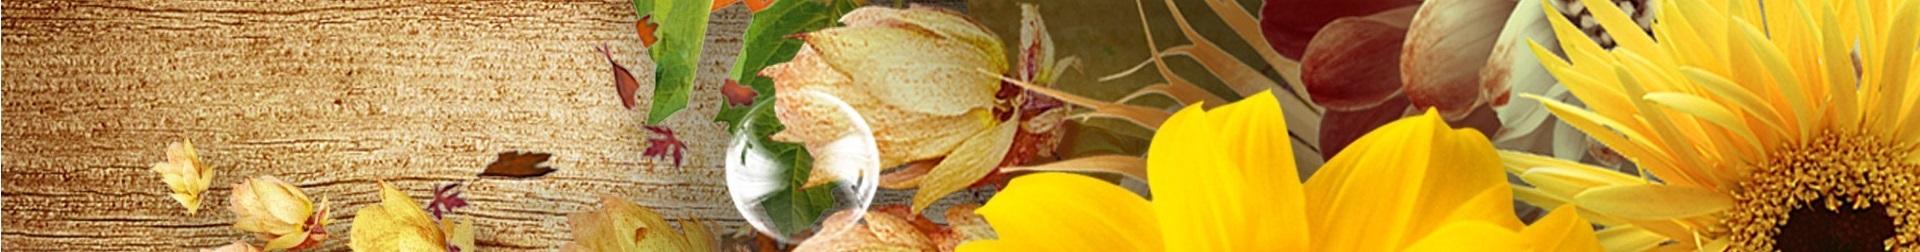 Flores de otoño e invierno